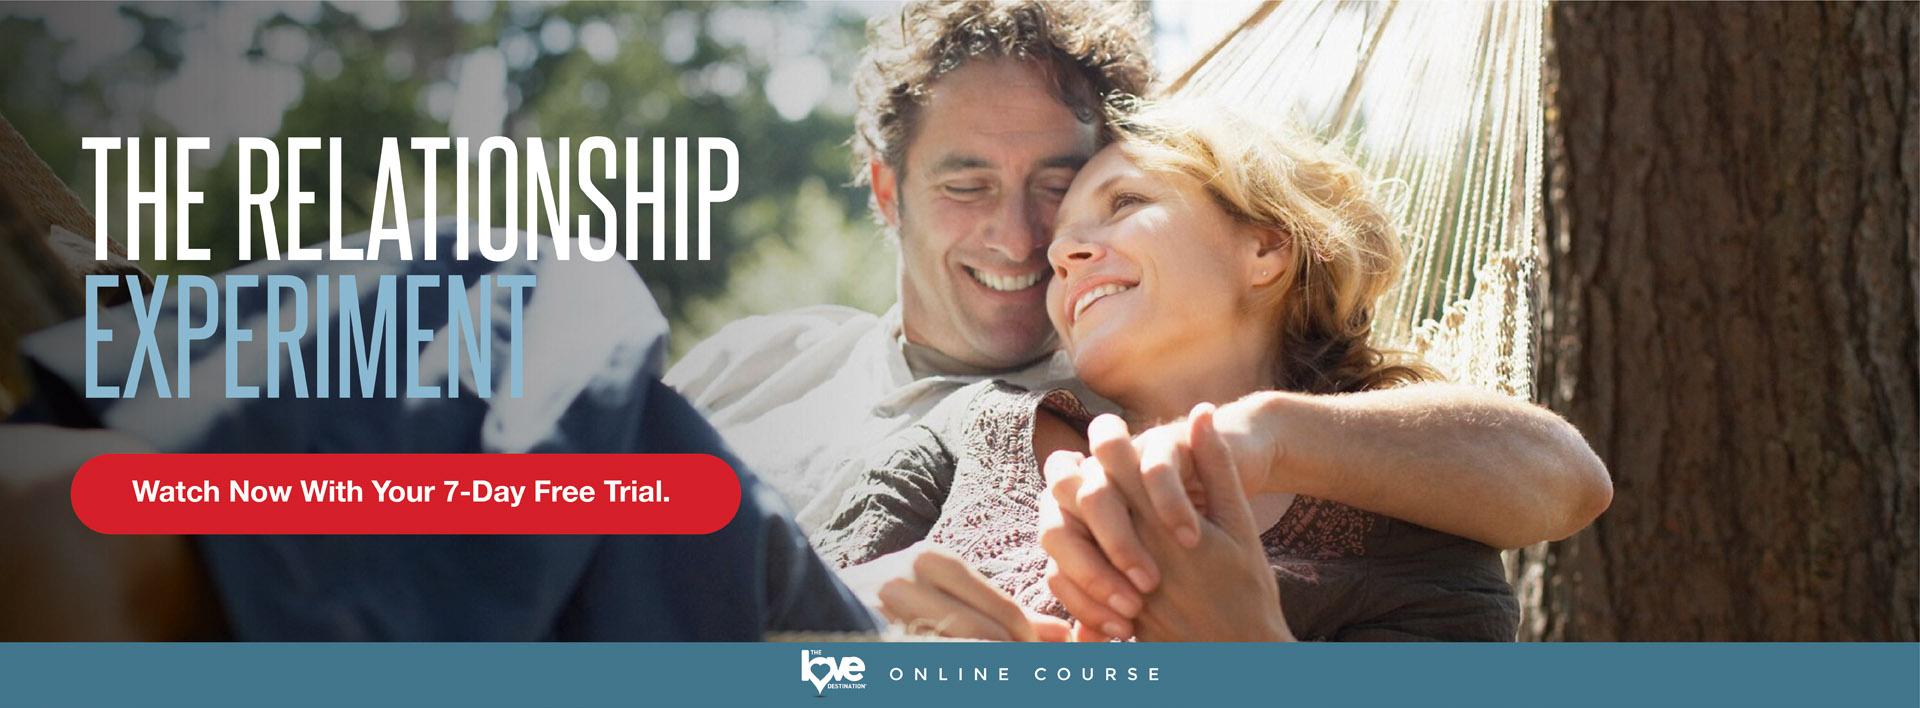 9-relationship-experiment